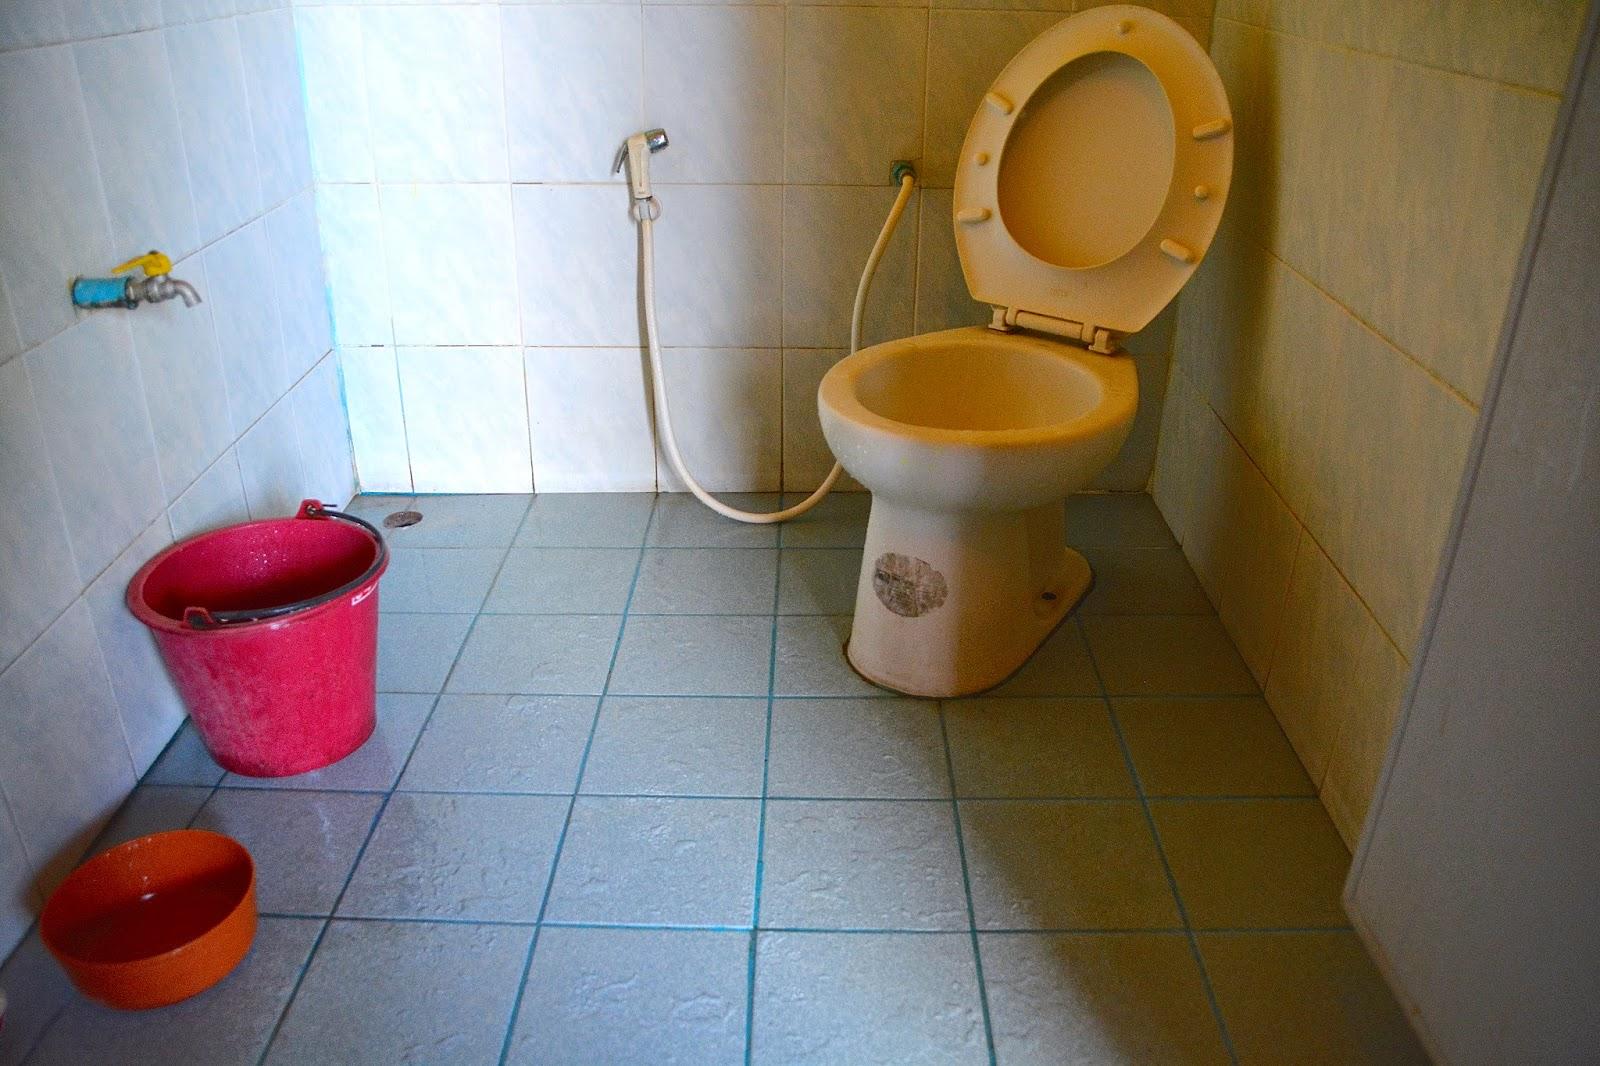 thai bathroom. Gallant explorations in Thai bathrooms  Inspiration solo travel